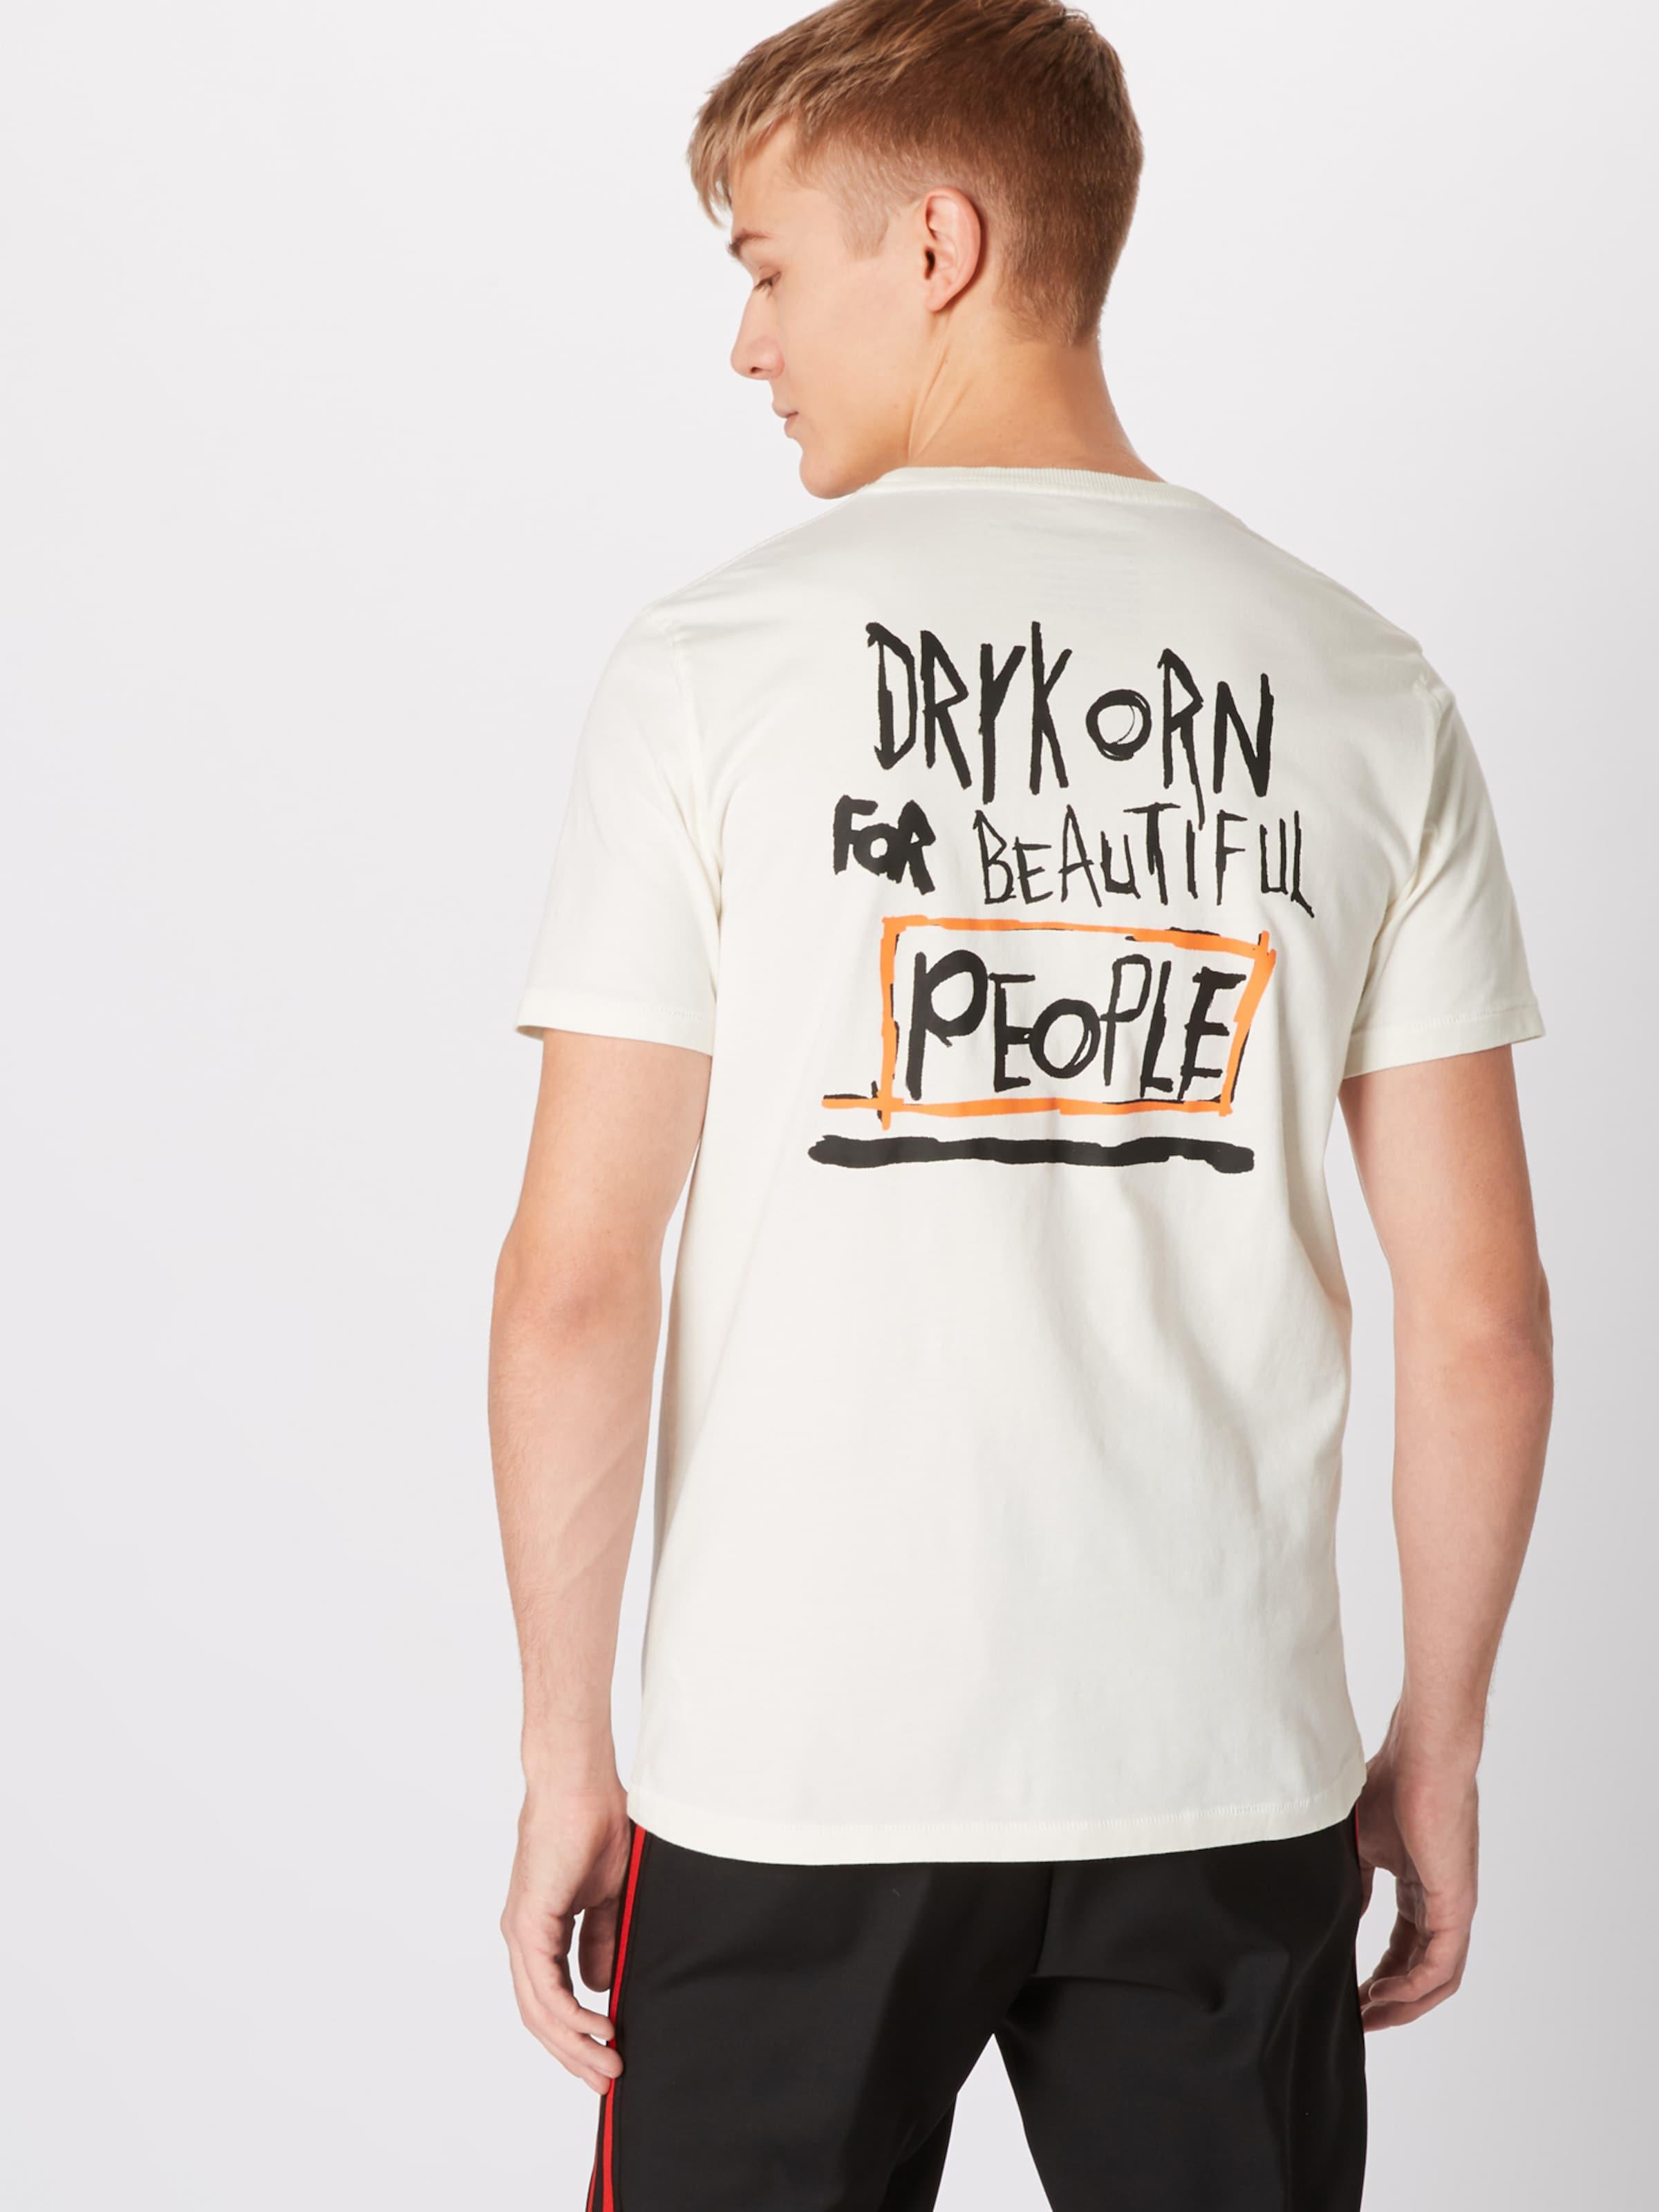 In Drykorn Shirts 'samuel SchwarzWeiß people' SMUpVz